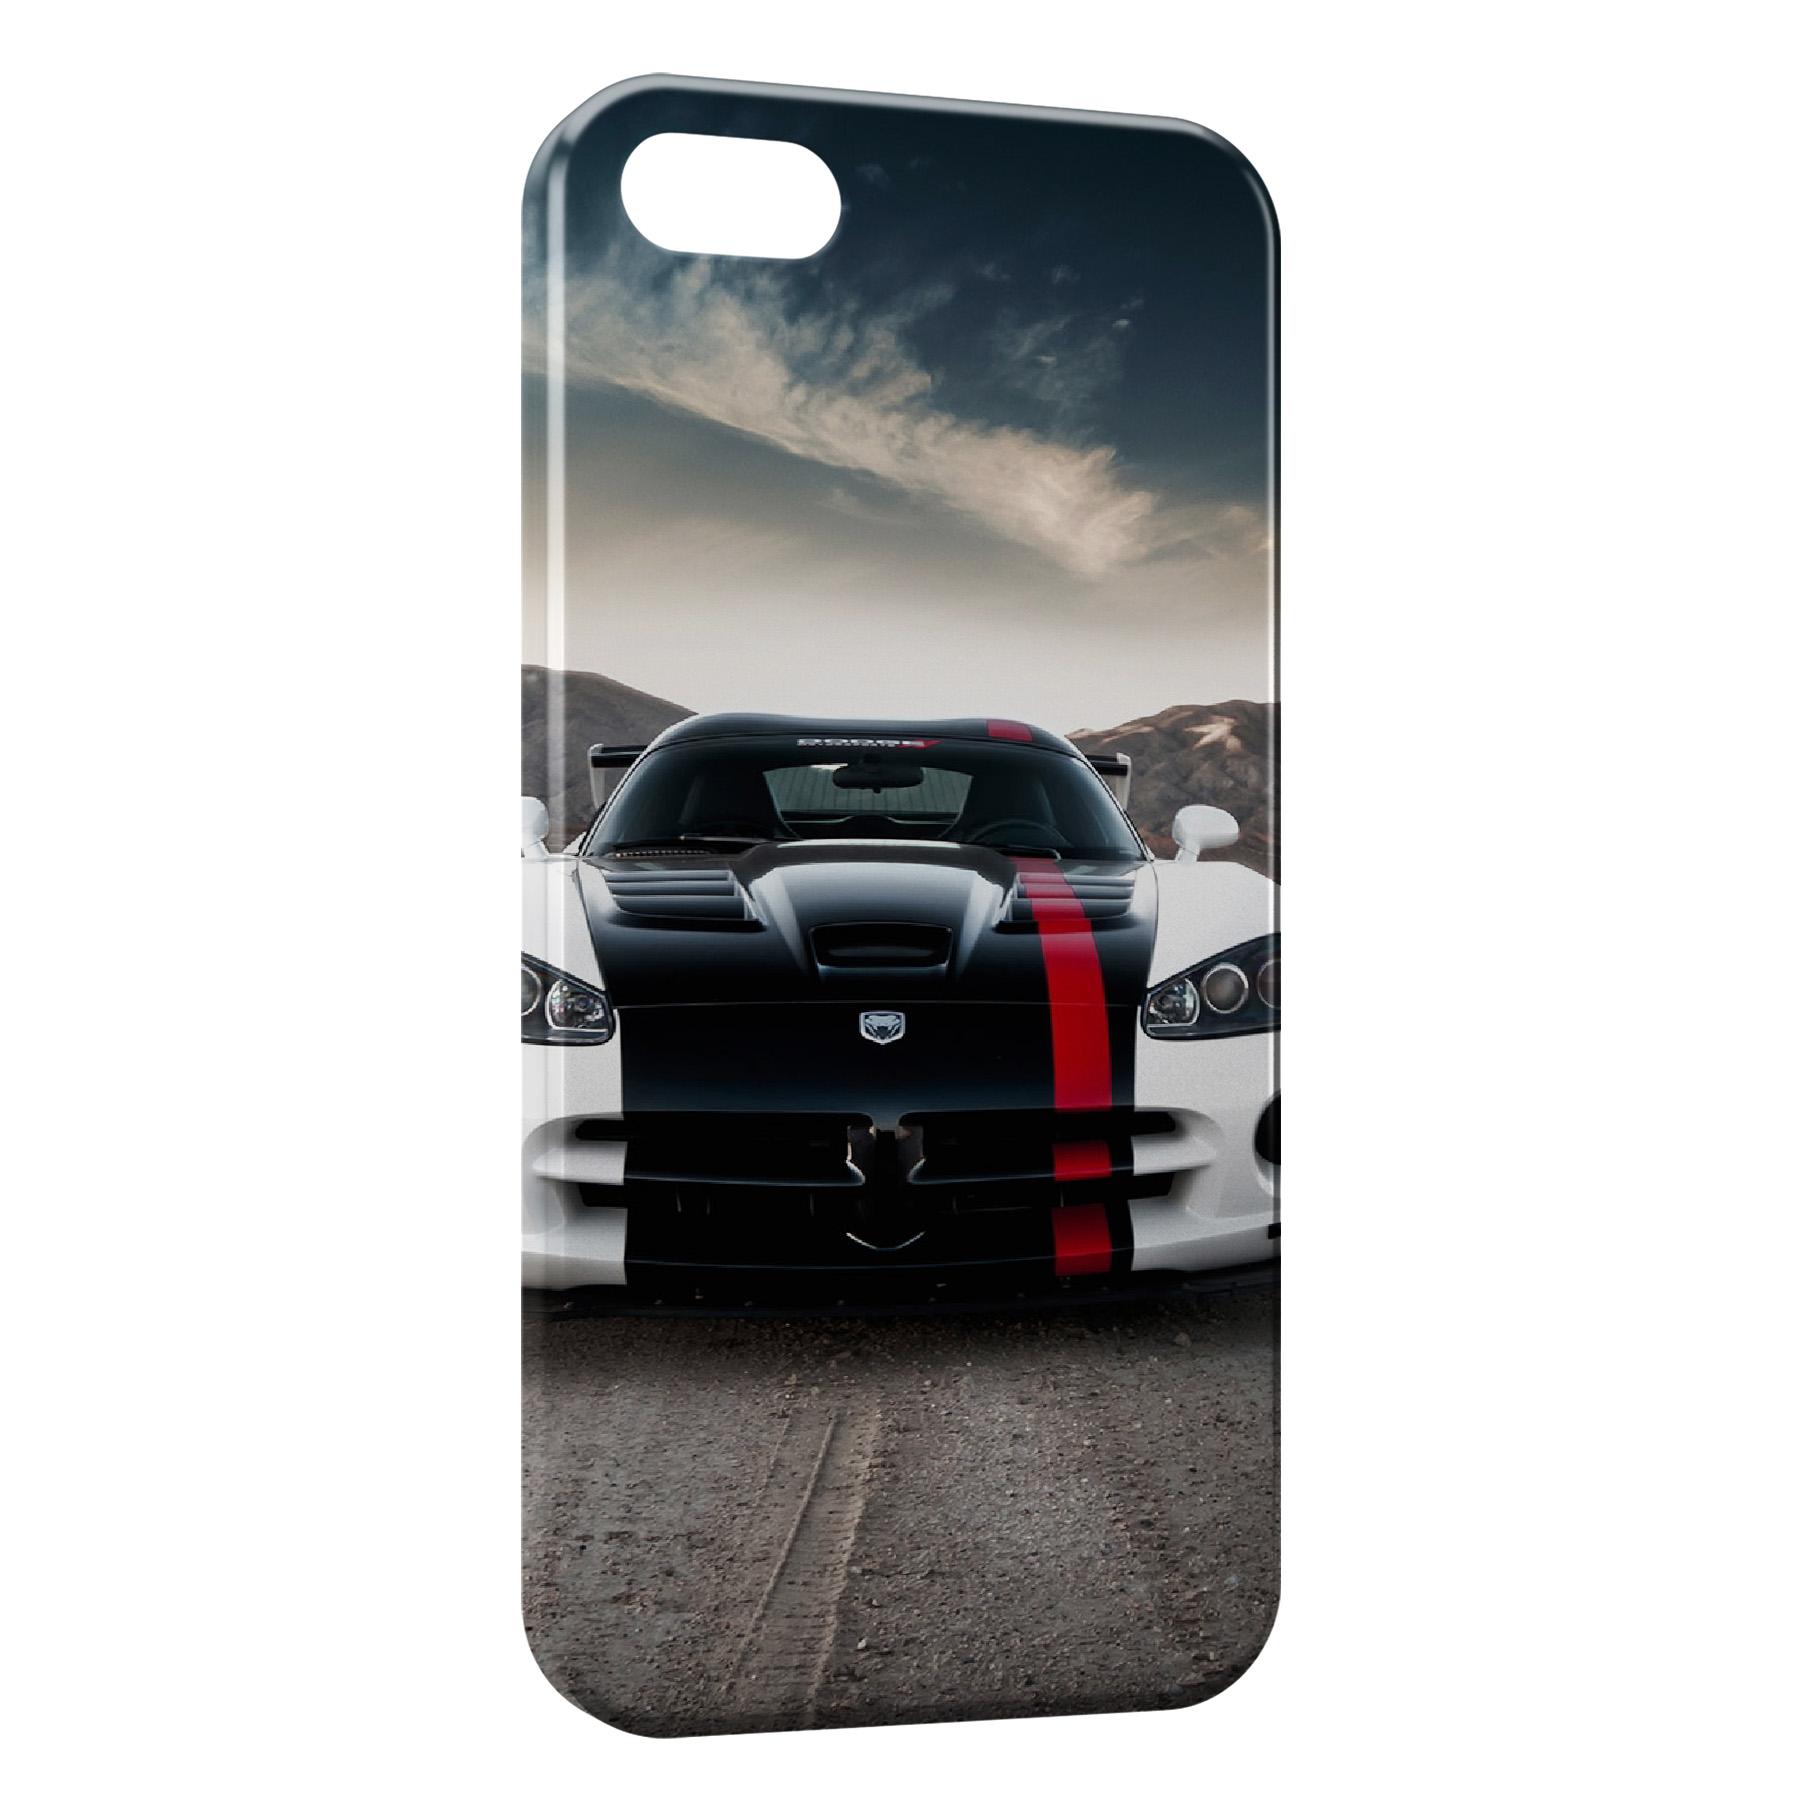 Coque iPhone 6 & 6S Viper voiture White & Black